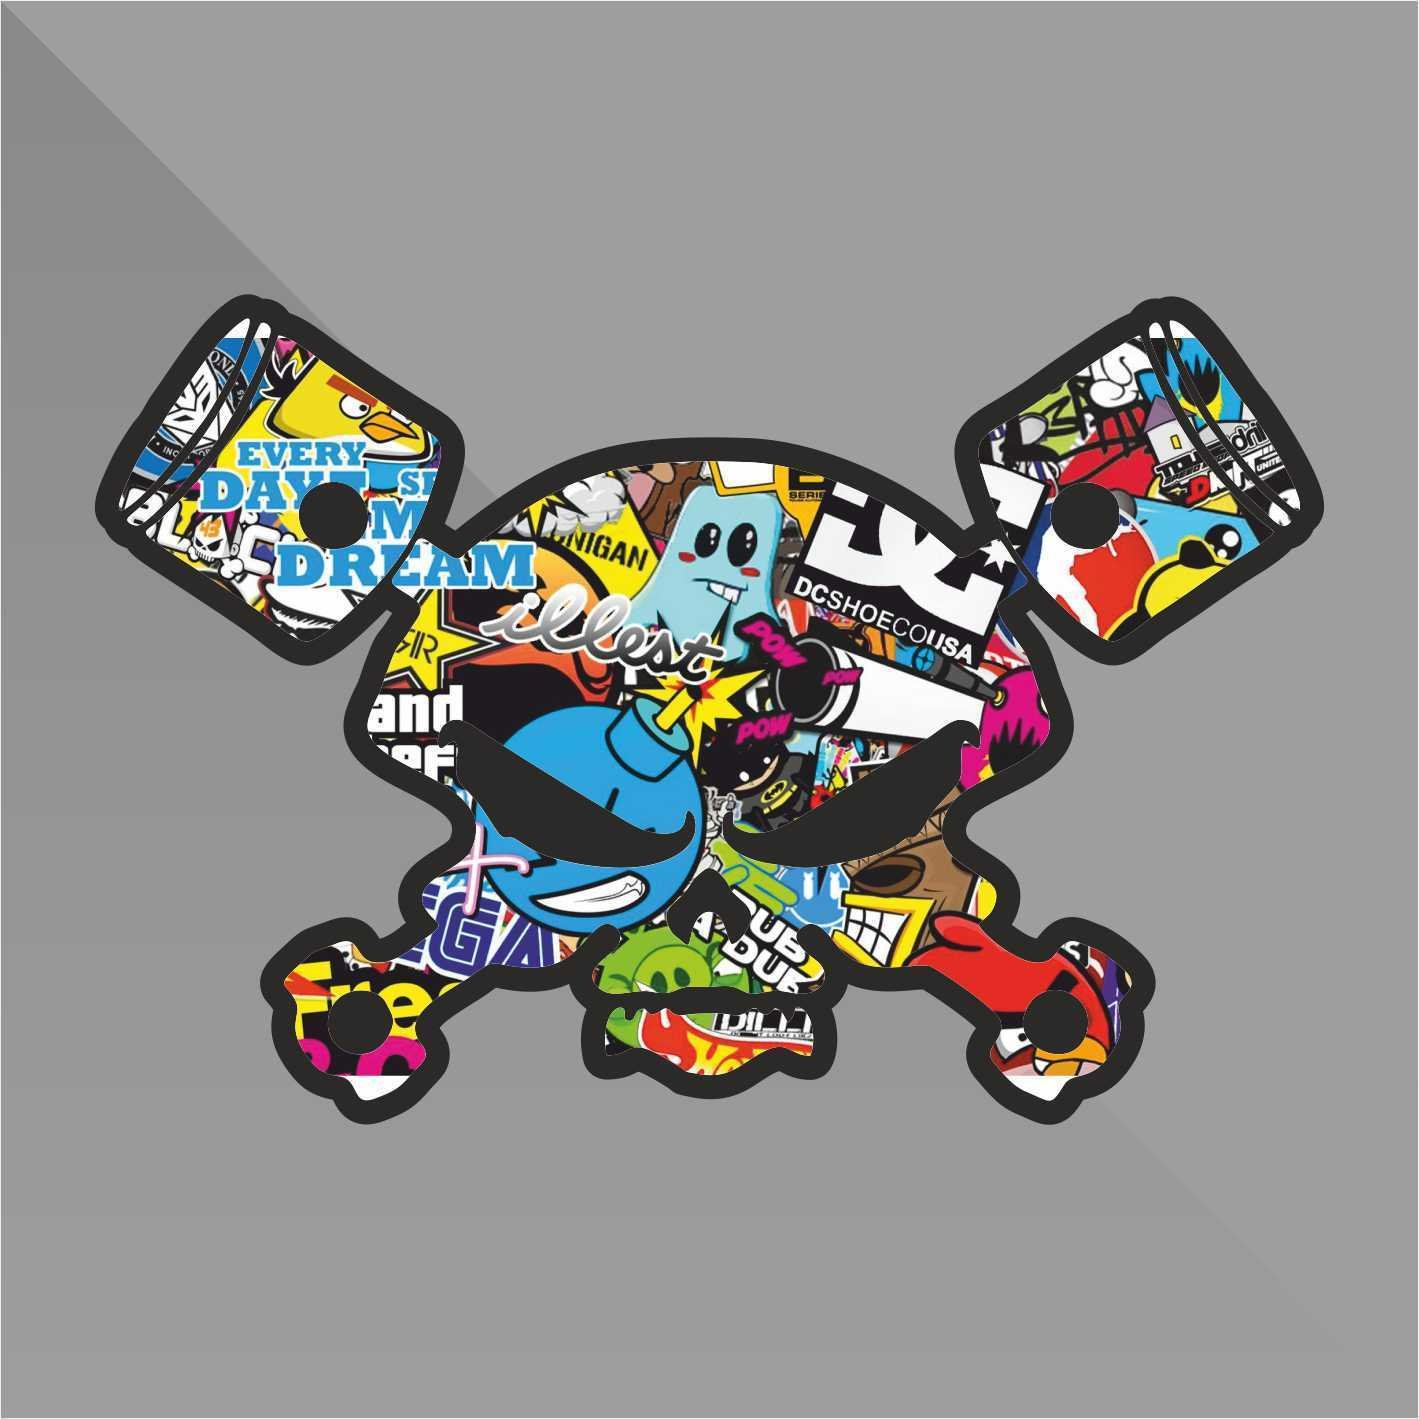 Sticker Bomb Teschio Skull Crâ ne Crá neo Schä del Pistoni Pistons Punisher - Decal Auto Moto Casco Wall Camper Bike Adesivo Adhesive Autocollant Pegatina Aufkleber - cm 10 erreinge